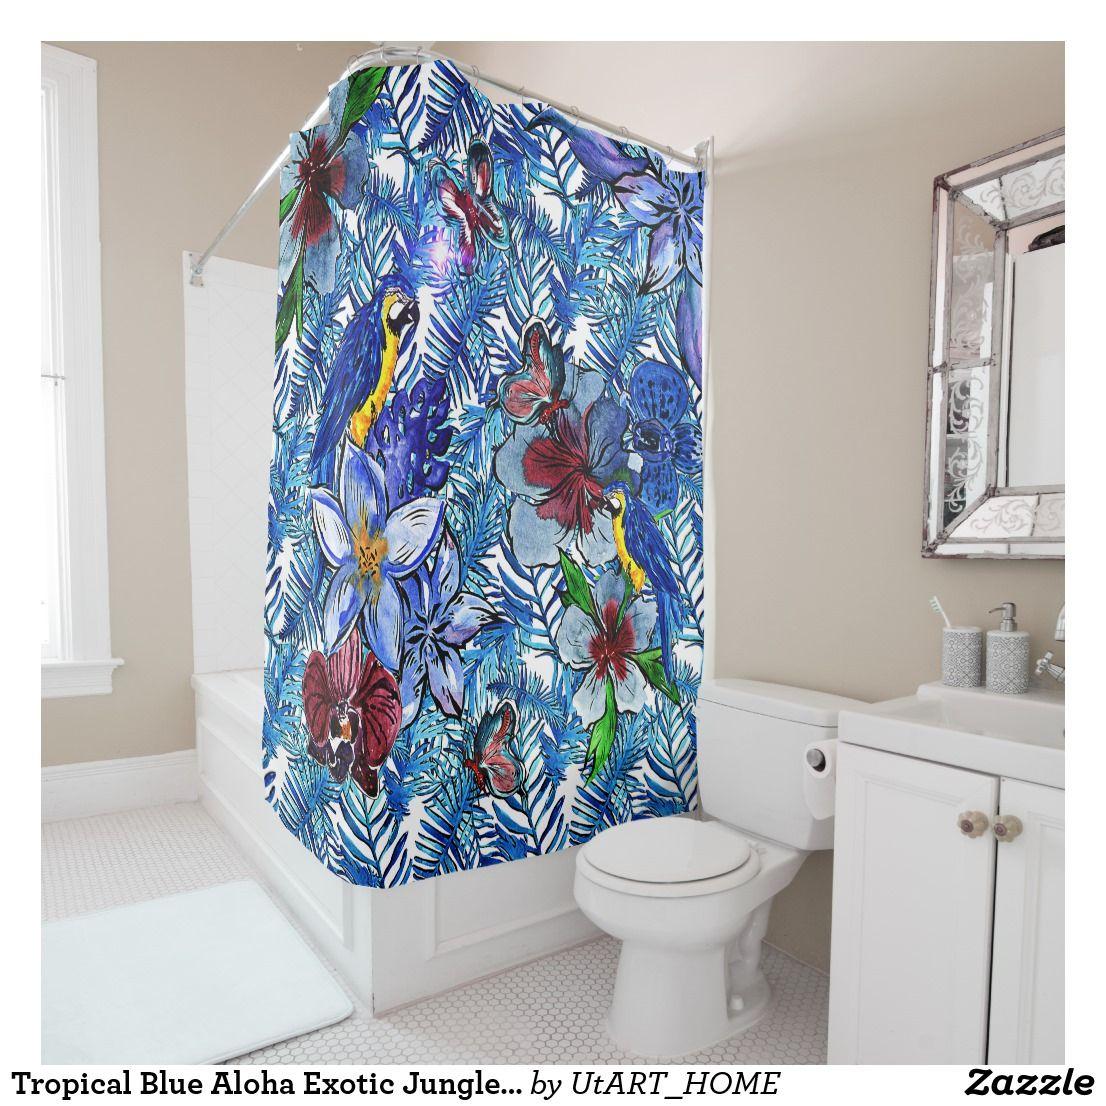 Robinet Salle De Bain Gamma ~ Tropical Blue Aloha Exotic Jungle Parot Flowers Shower Curtain